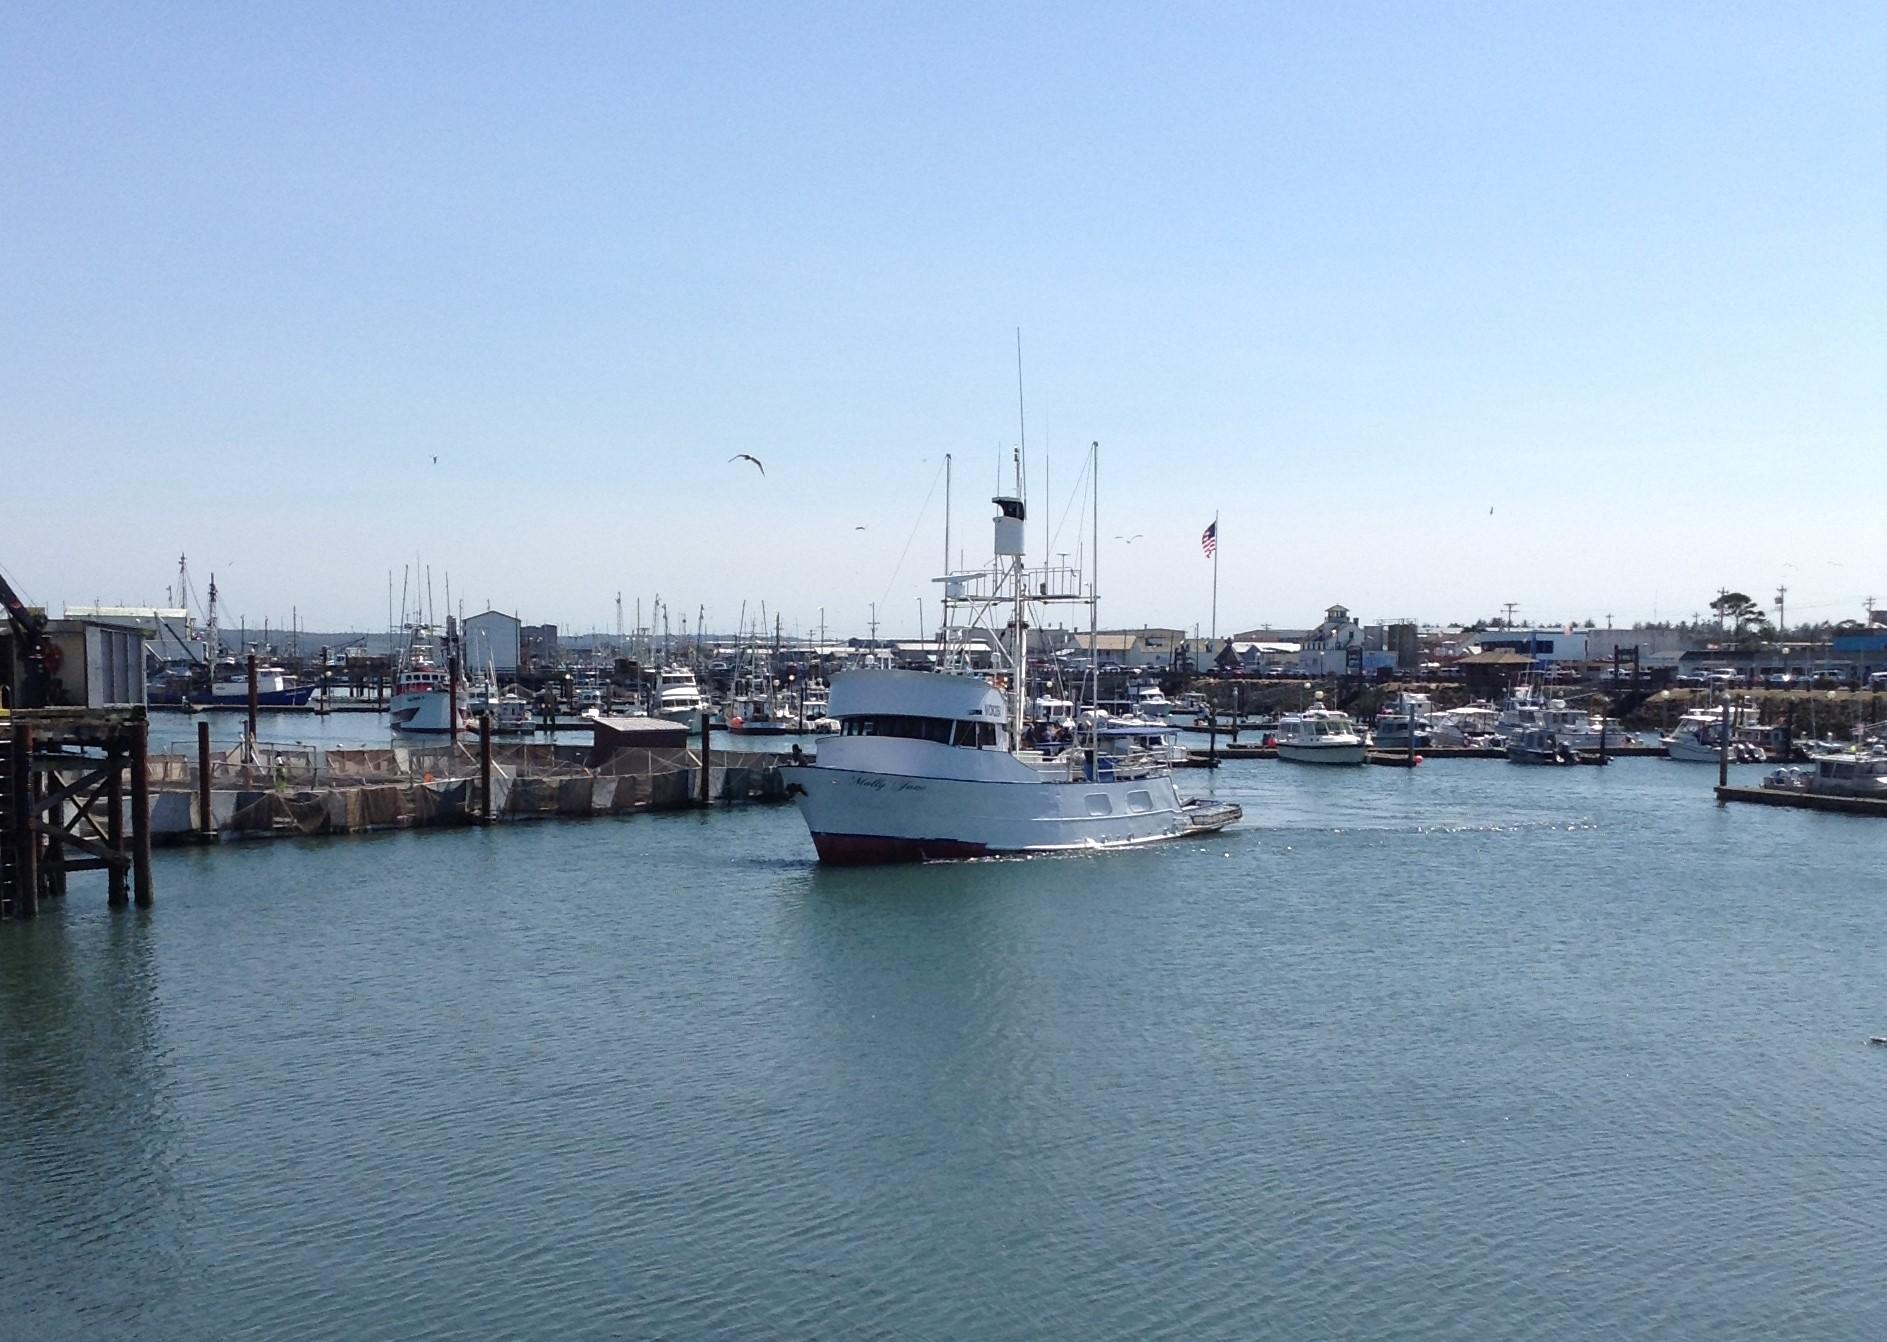 Commercial Boat heading to unload fish at docks-Westport Washington